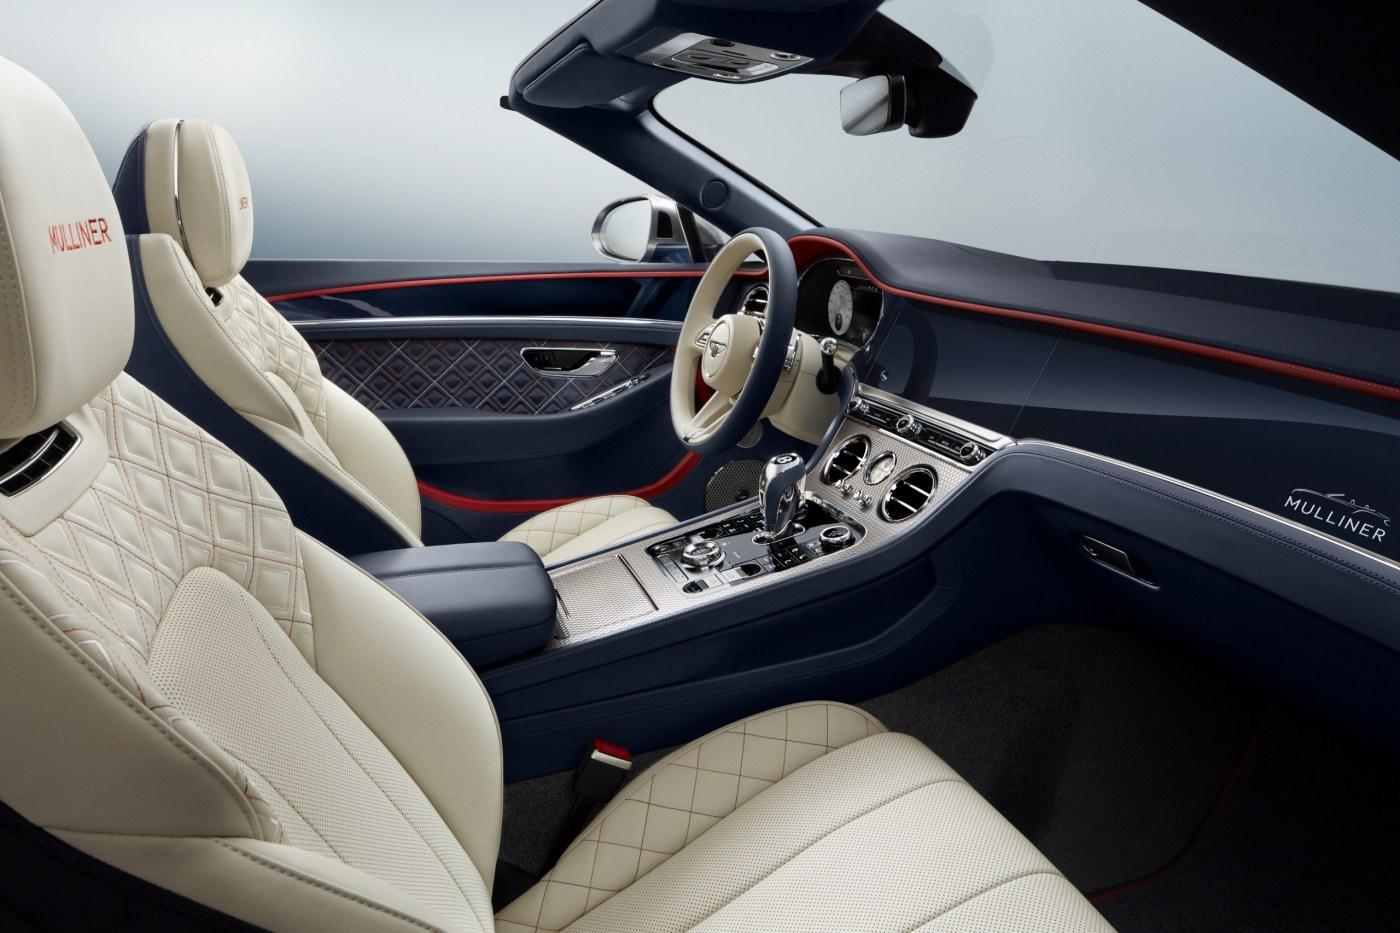 2020 Bentley Continental GT Mulliner Convertible interior